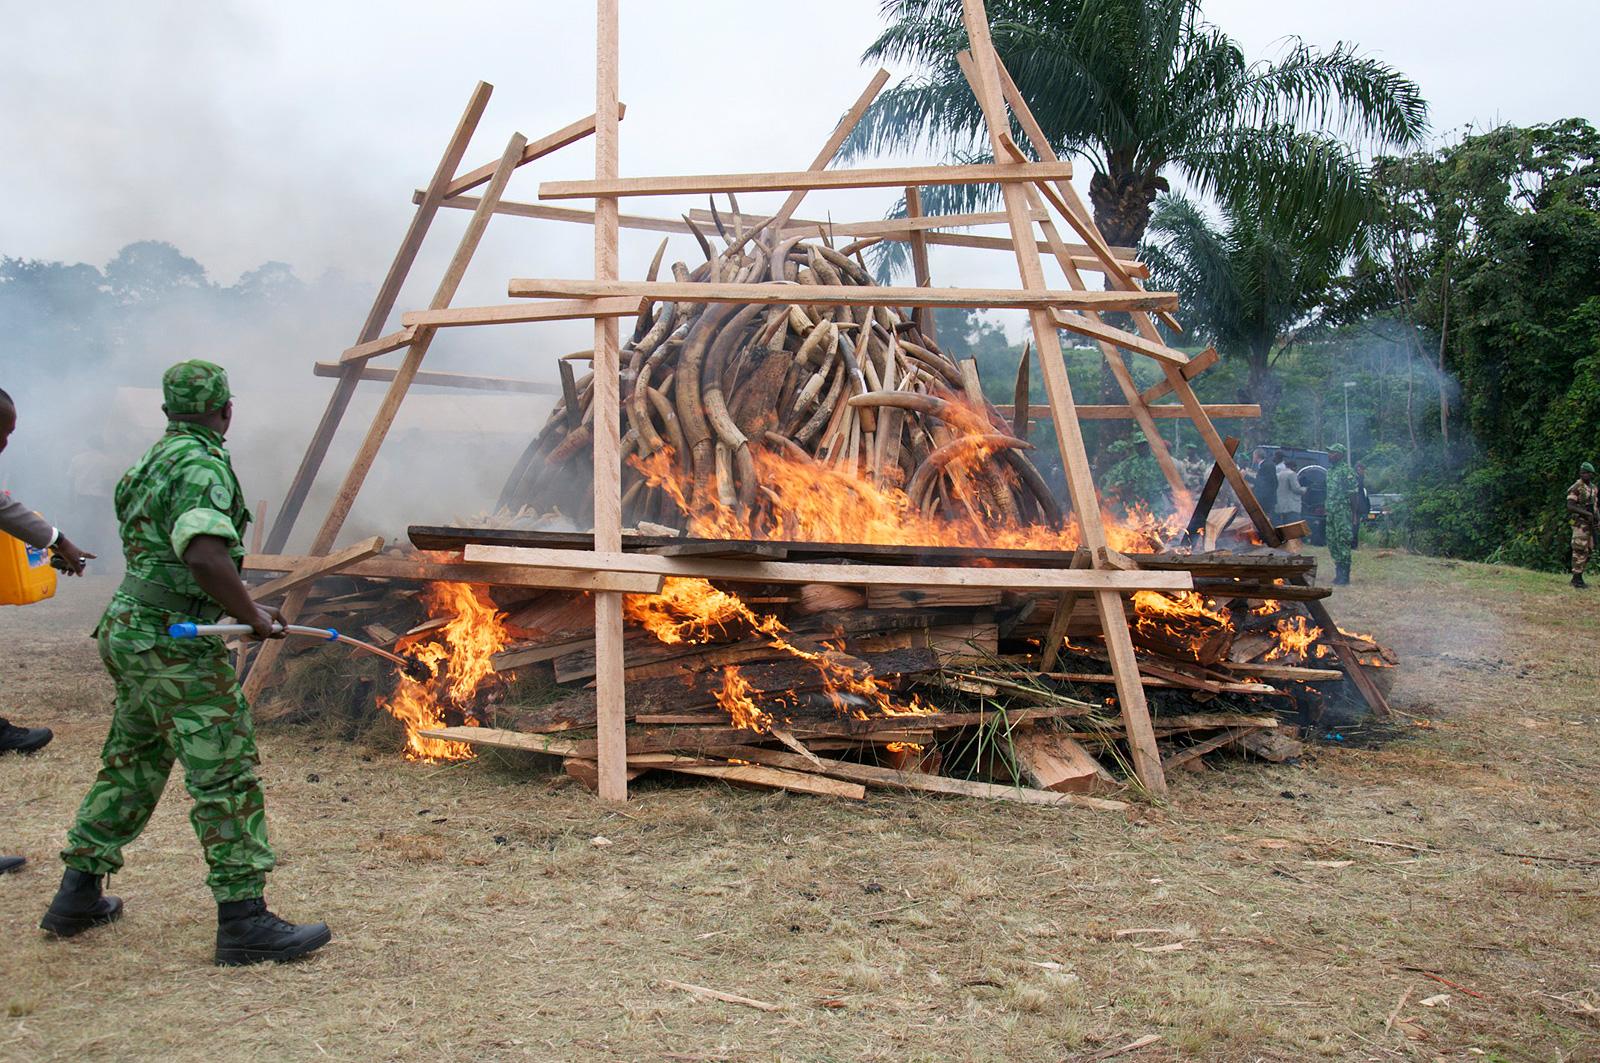 ivory-burn-gabon-africa-geographic-2